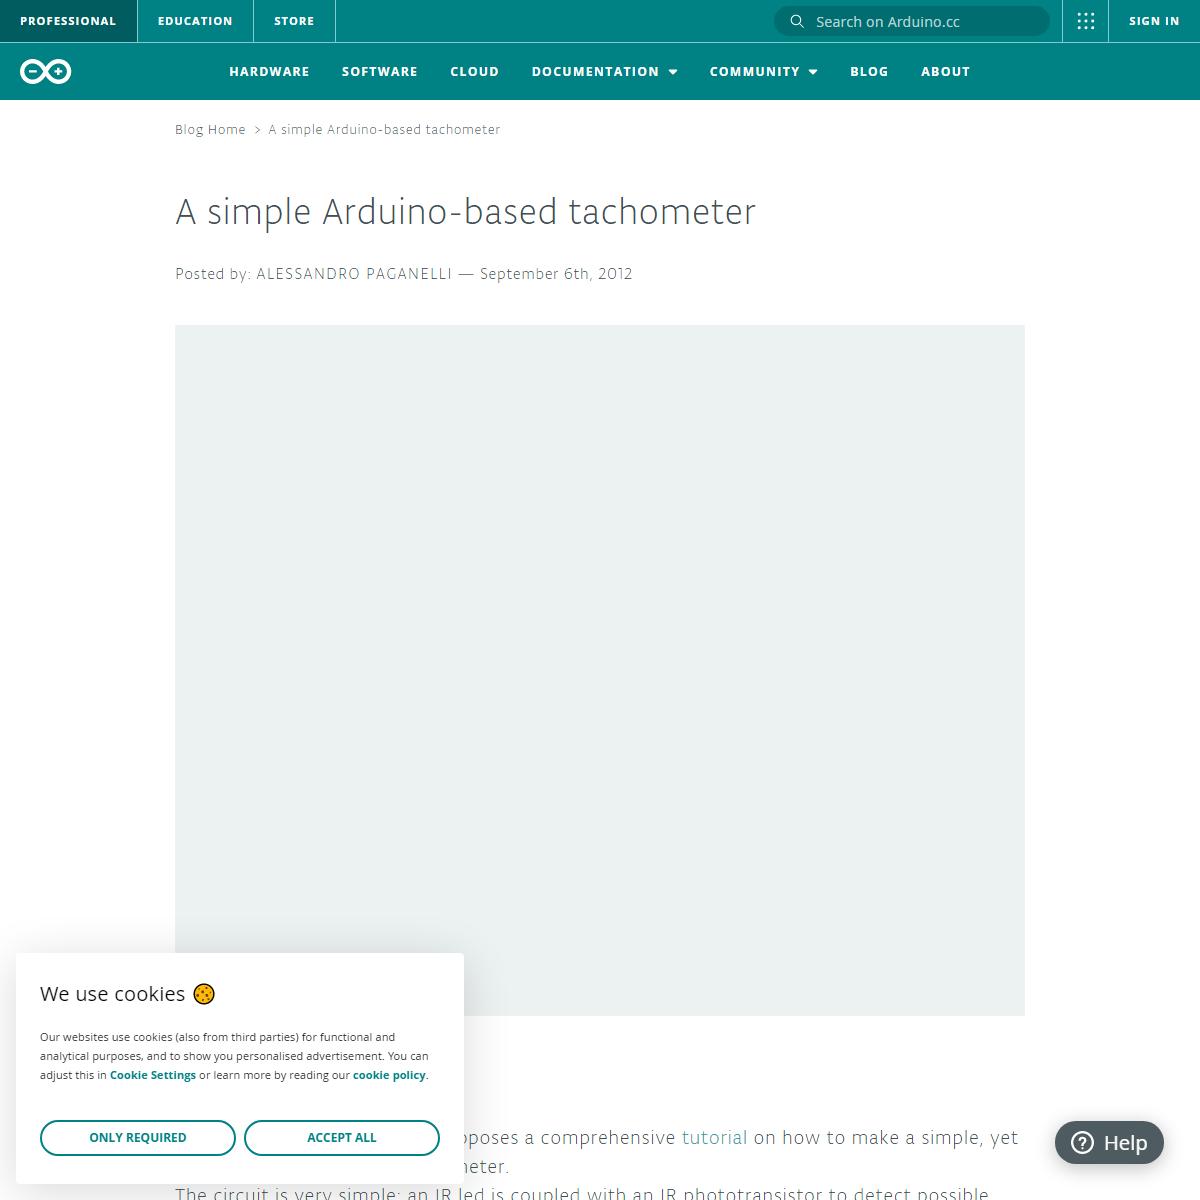 Arduino Blog » A simple Arduino-based tachometer